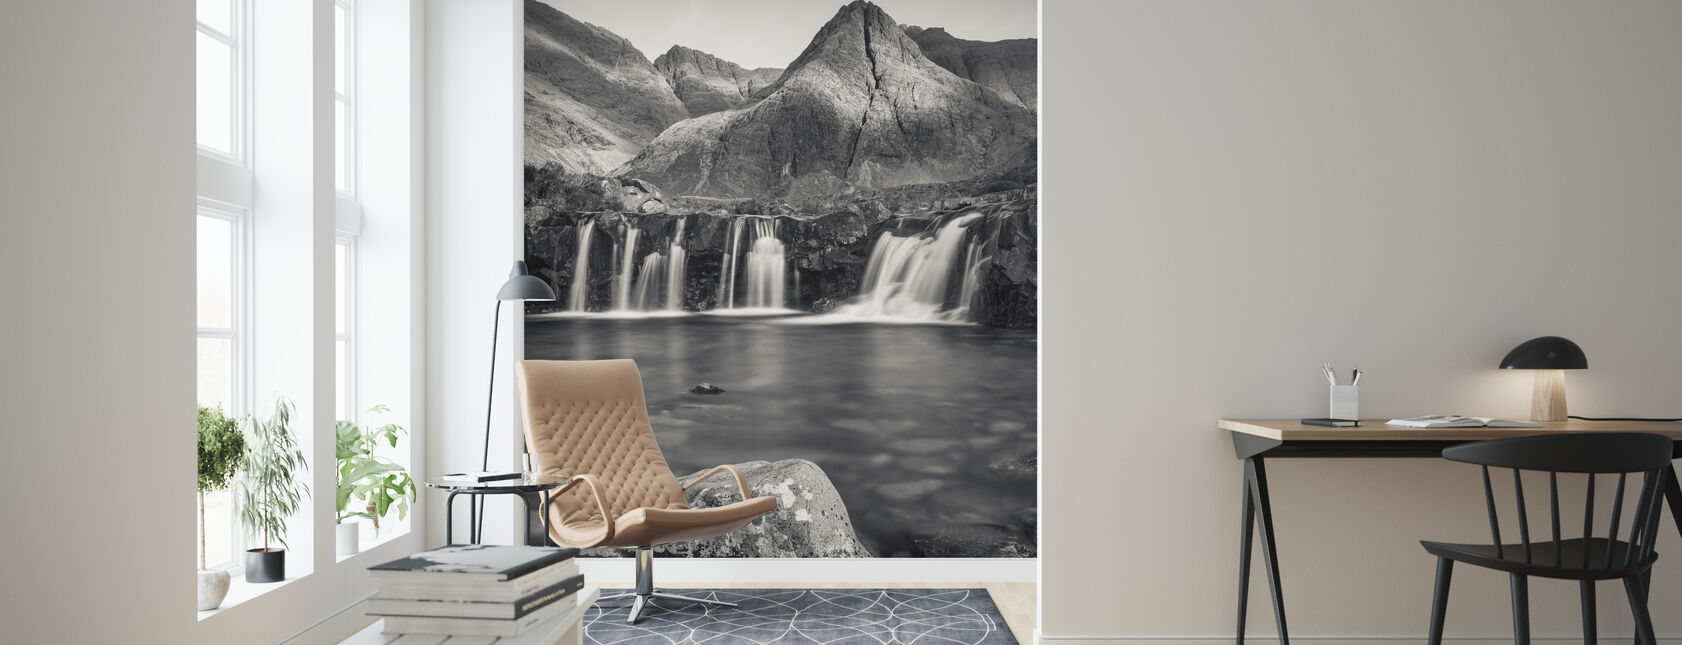 Fairy Pools, Isle of Skye - Scotland - Wallpaper - Living Room